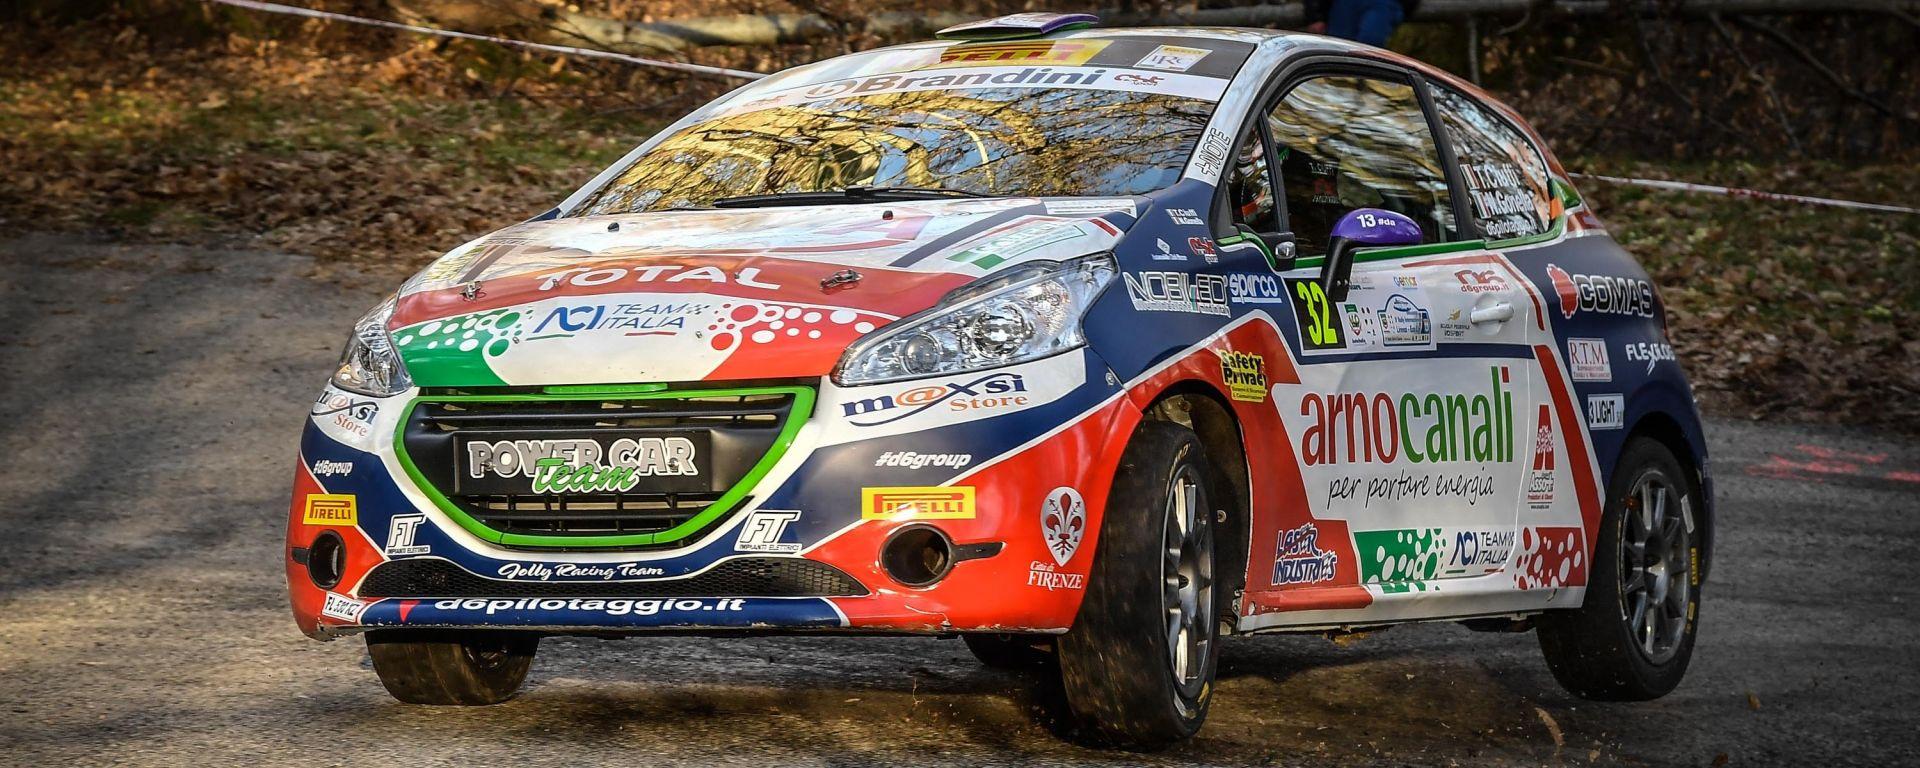 Peugeot Competition Rally 2018 al Rally Lirenas: il racconto